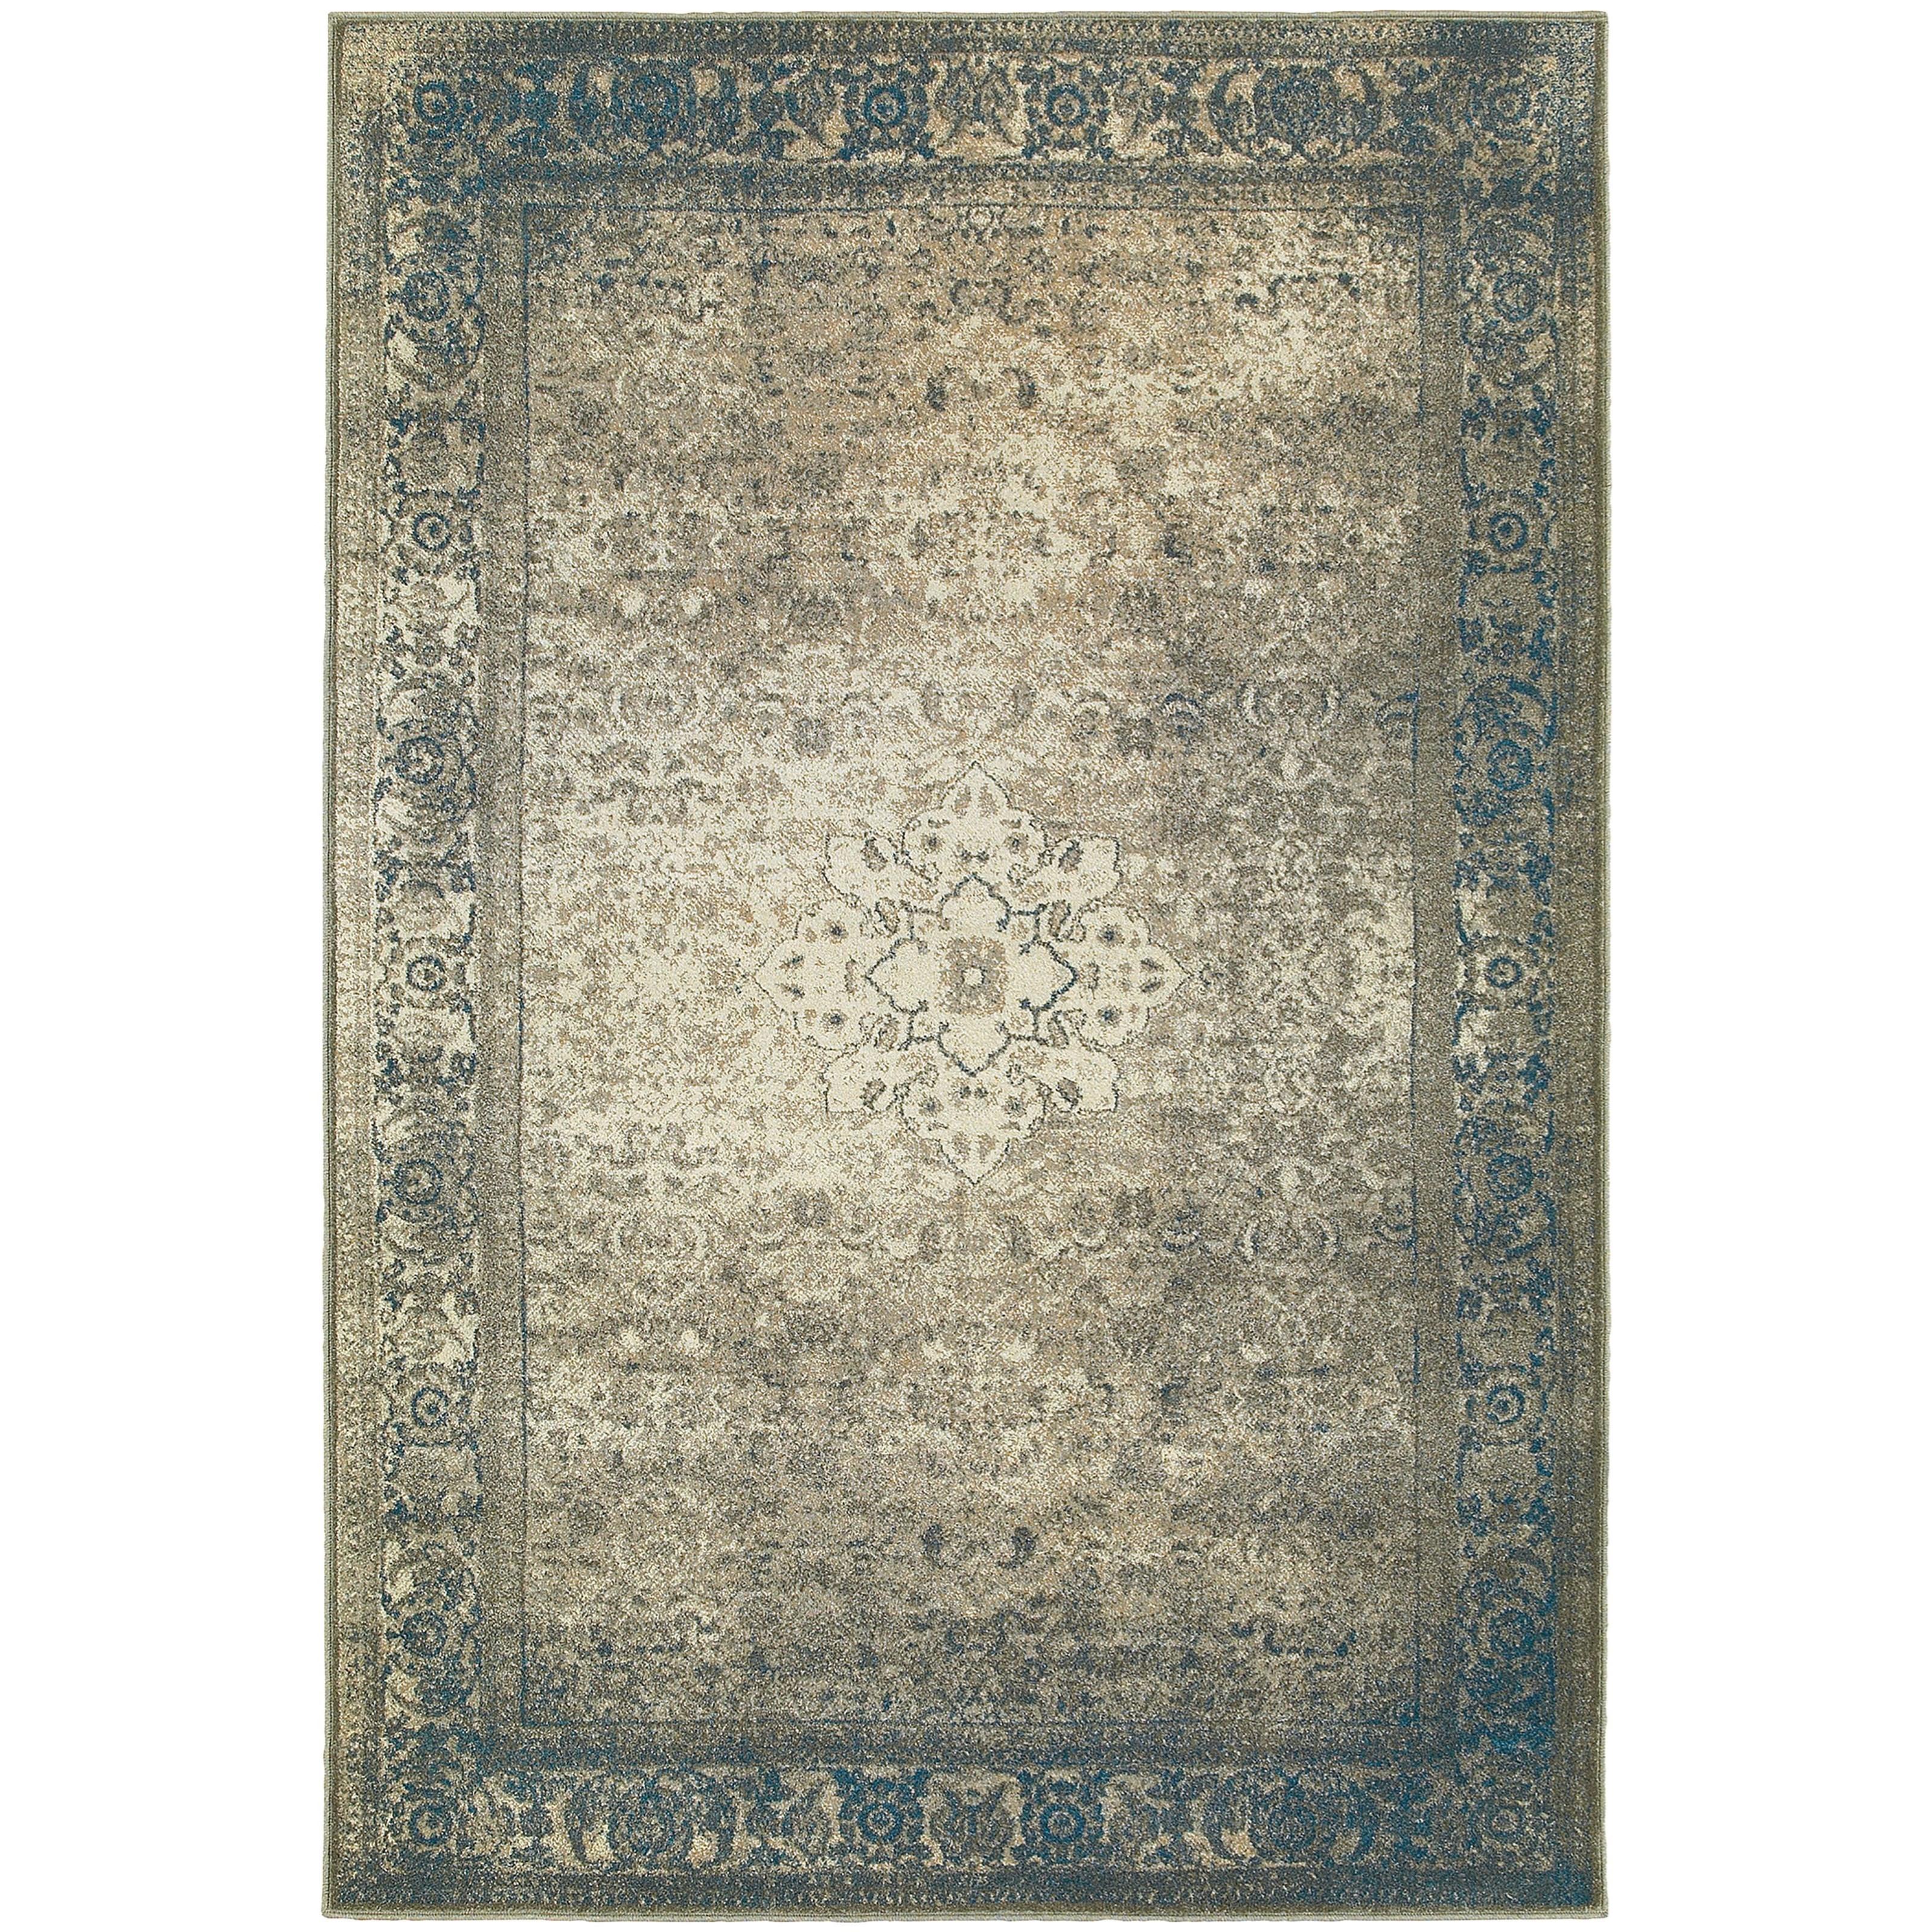 "Pasha 9'10"" X 12'10"" Rectangle Area Rug by Oriental Weavers at Novello Home Furnishings"